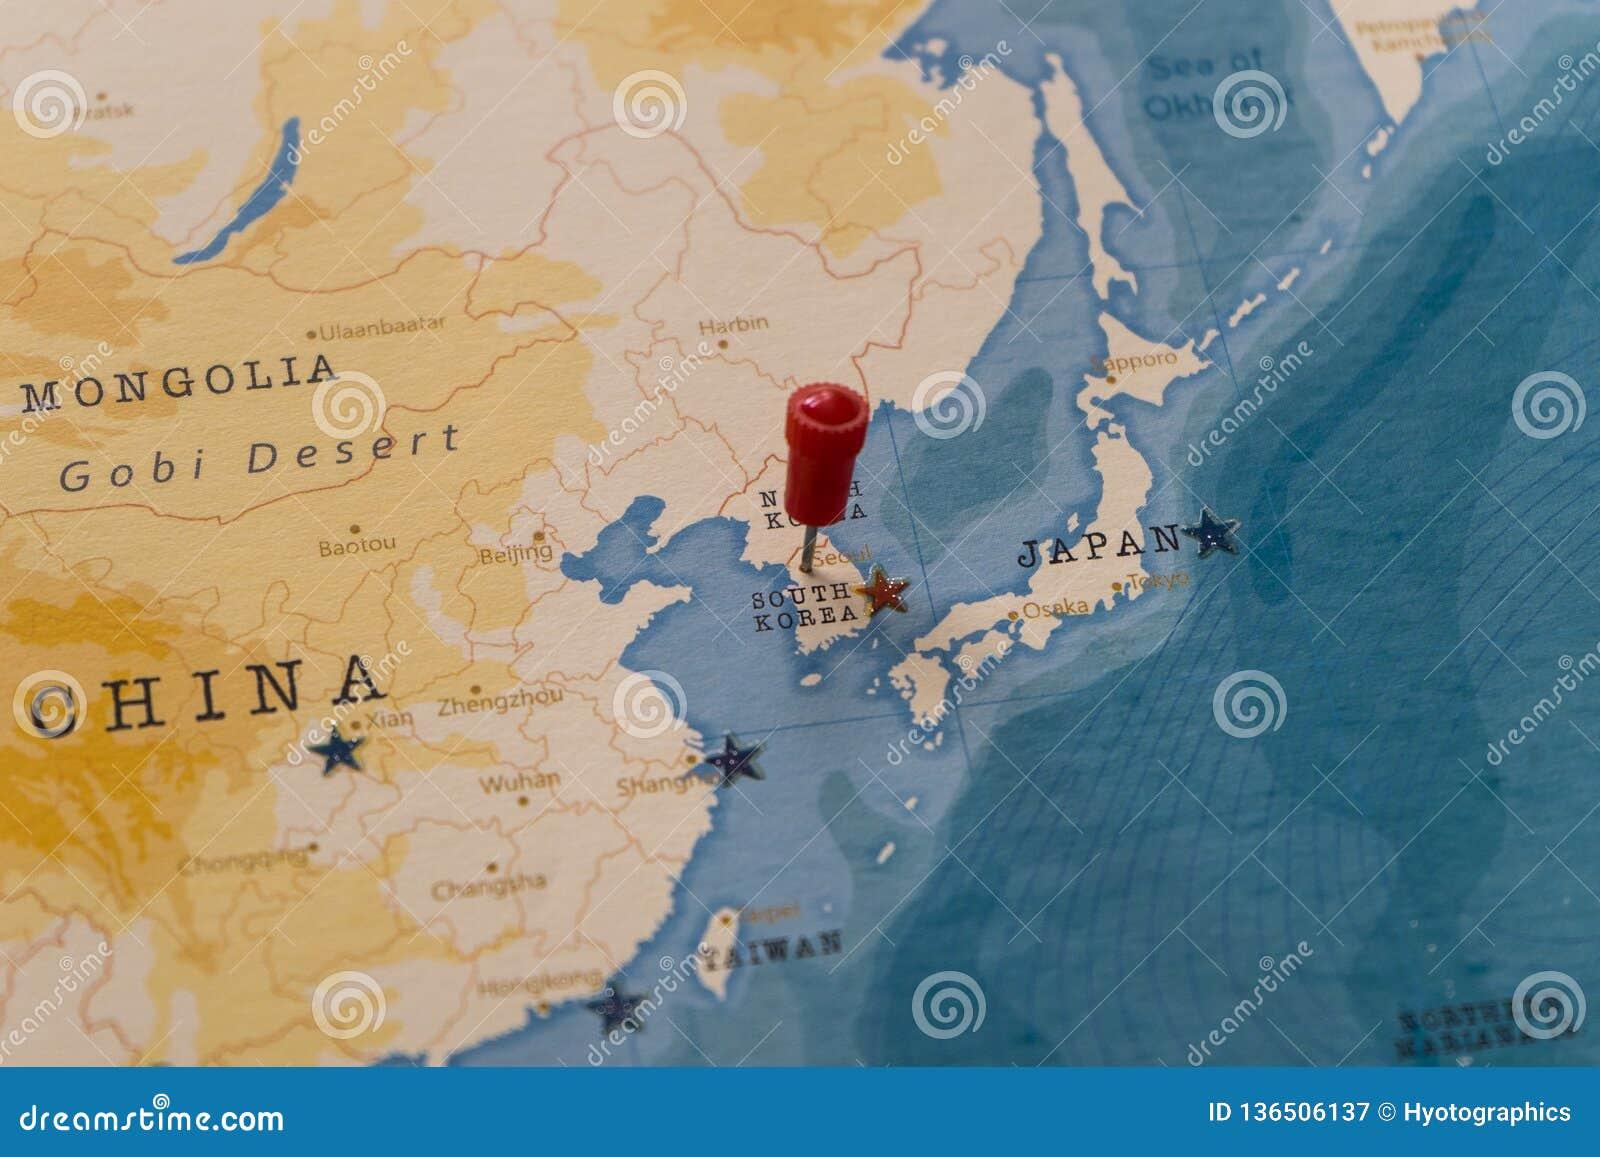 A Pin On Seoul, South Korea In The World Map Stock Image - Image of Korea World Map on daum korea, nerium korea, world flag korea, incheon korea, army posts in korea, us bases korea, location of korea, world hotel korea, mers korea, old korea, in which continent is korea, south korea, mark lippert korea, ocean world korea, bambino korea, itaewon korea, north korea,